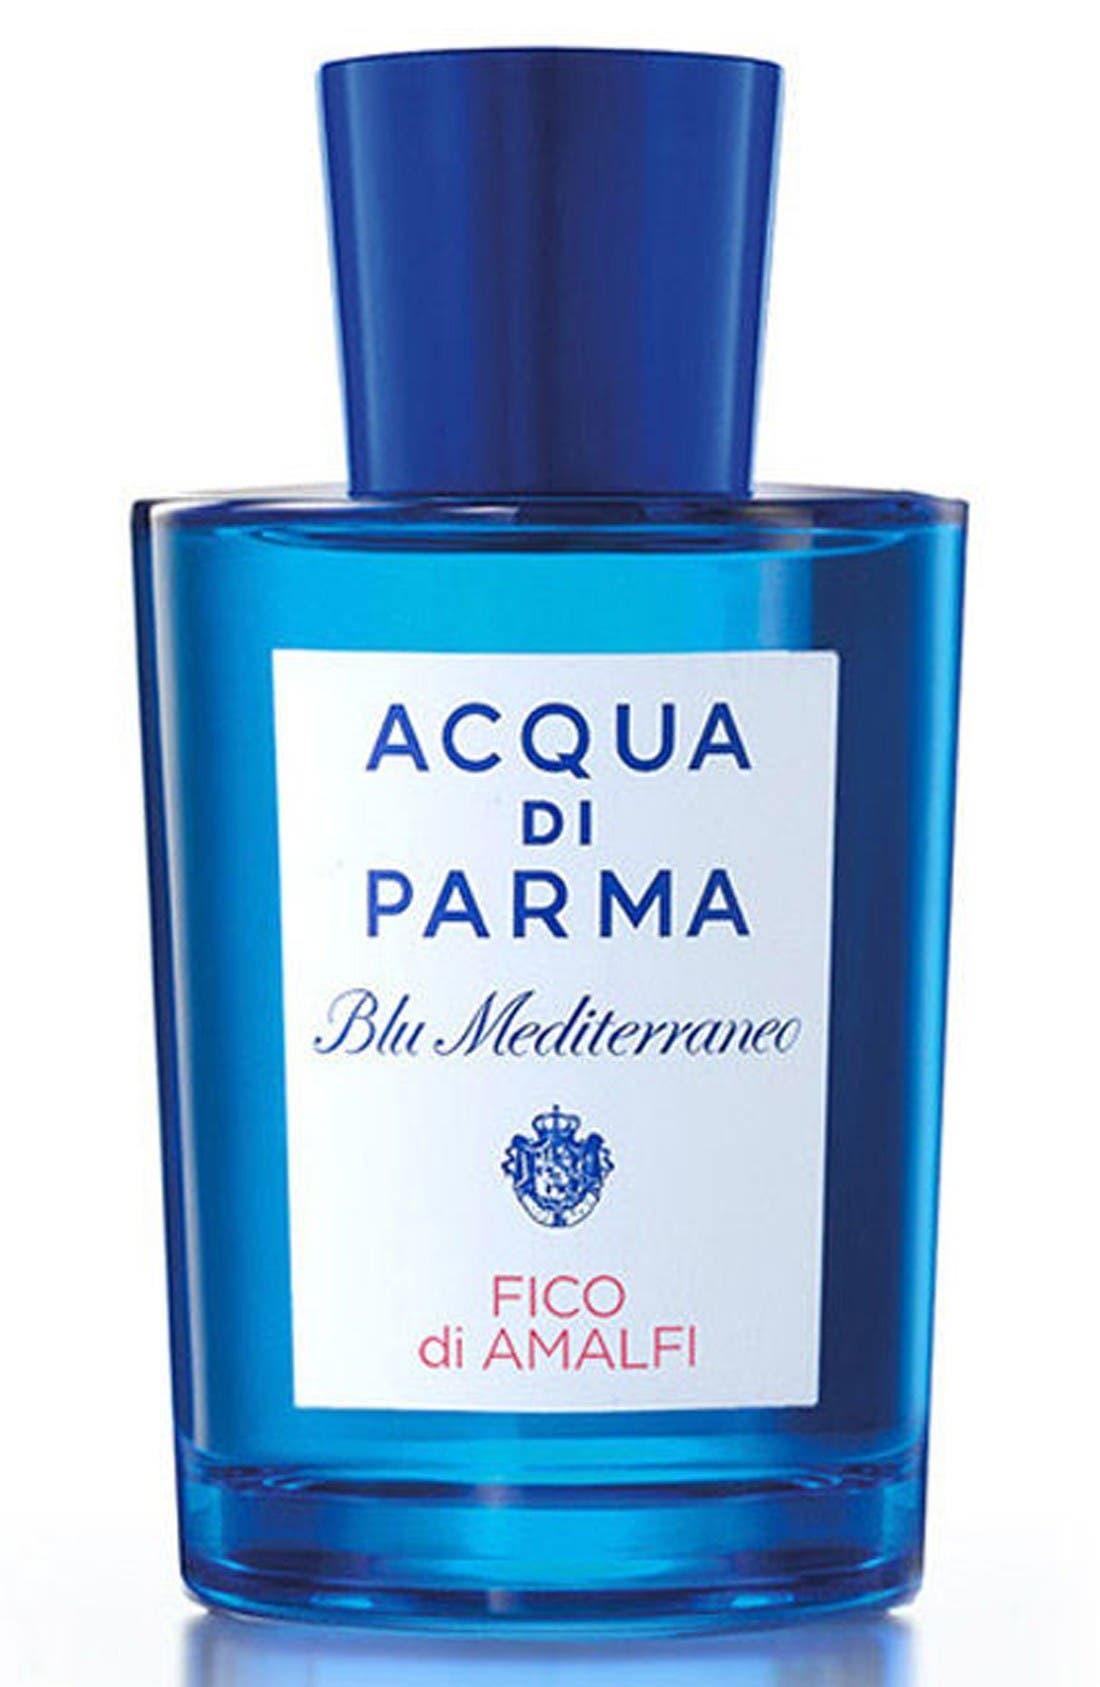 Main Image - Acqua di Parma 'Blu Mediterraneo' Fico di Amalfi Eau de Toilette Spray